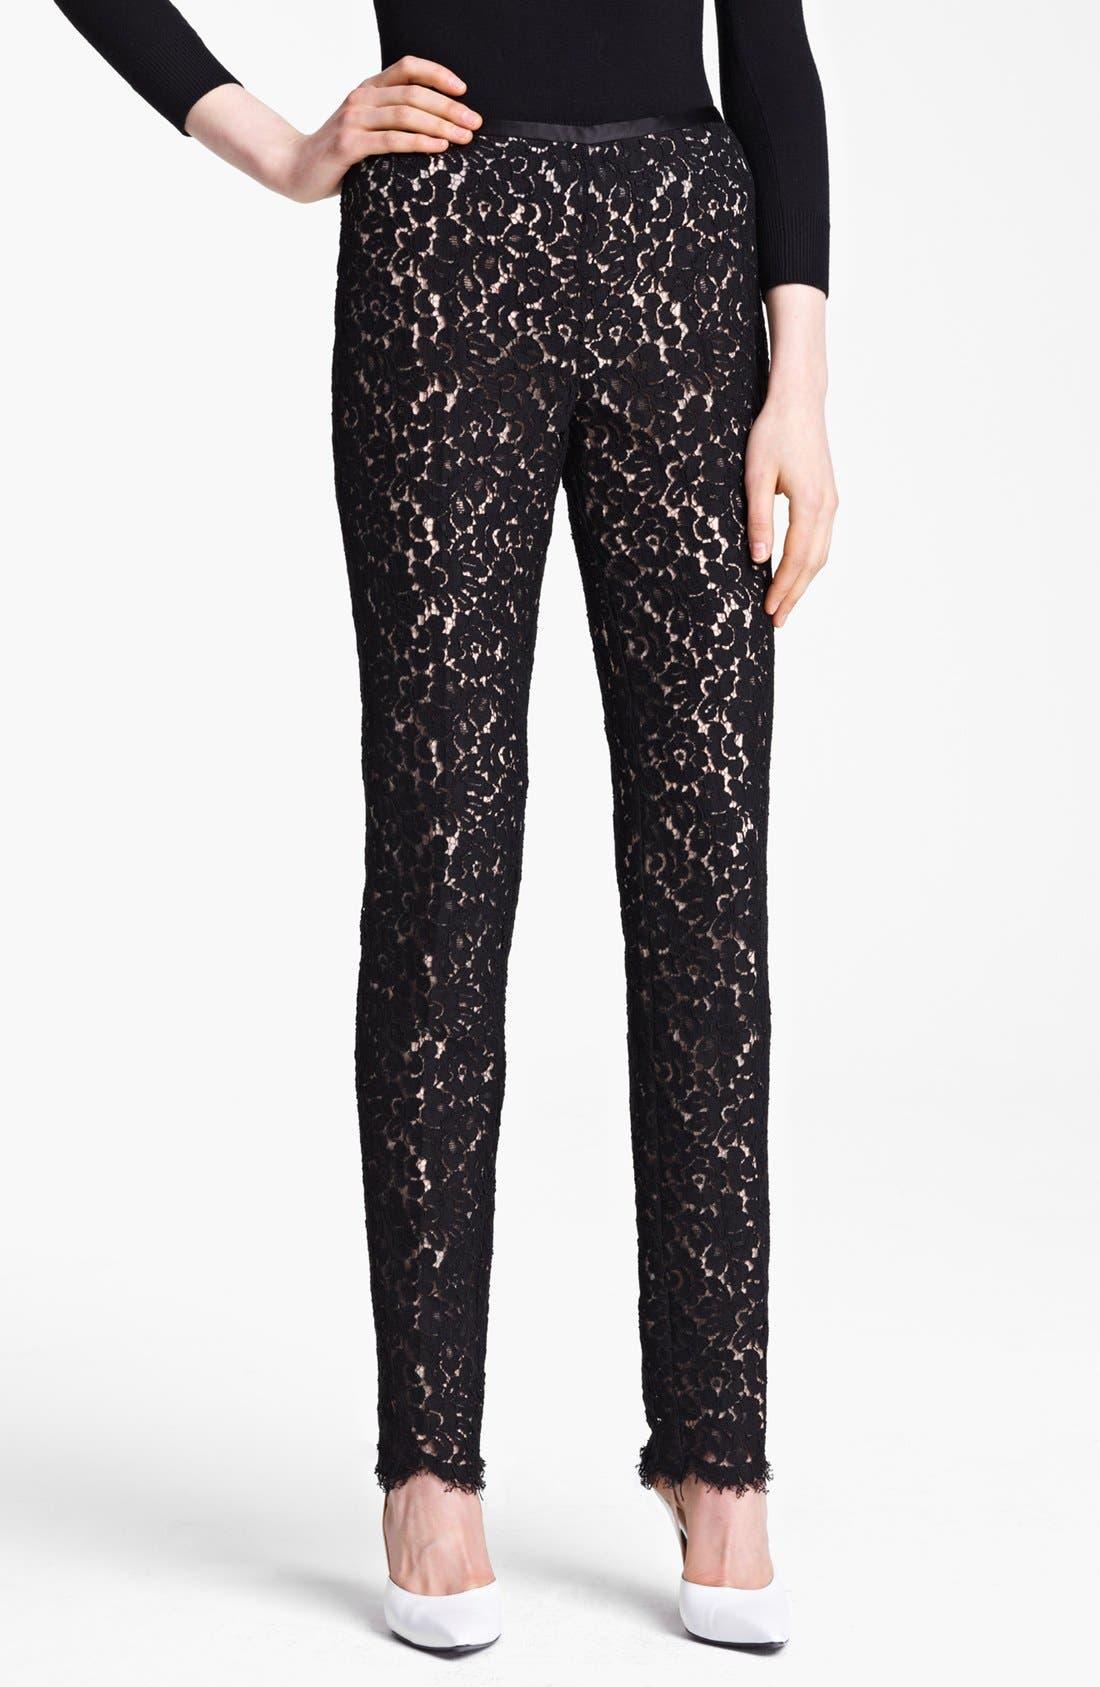 Alternate Image 1 Selected - Michael Kors Floral Lace Pants